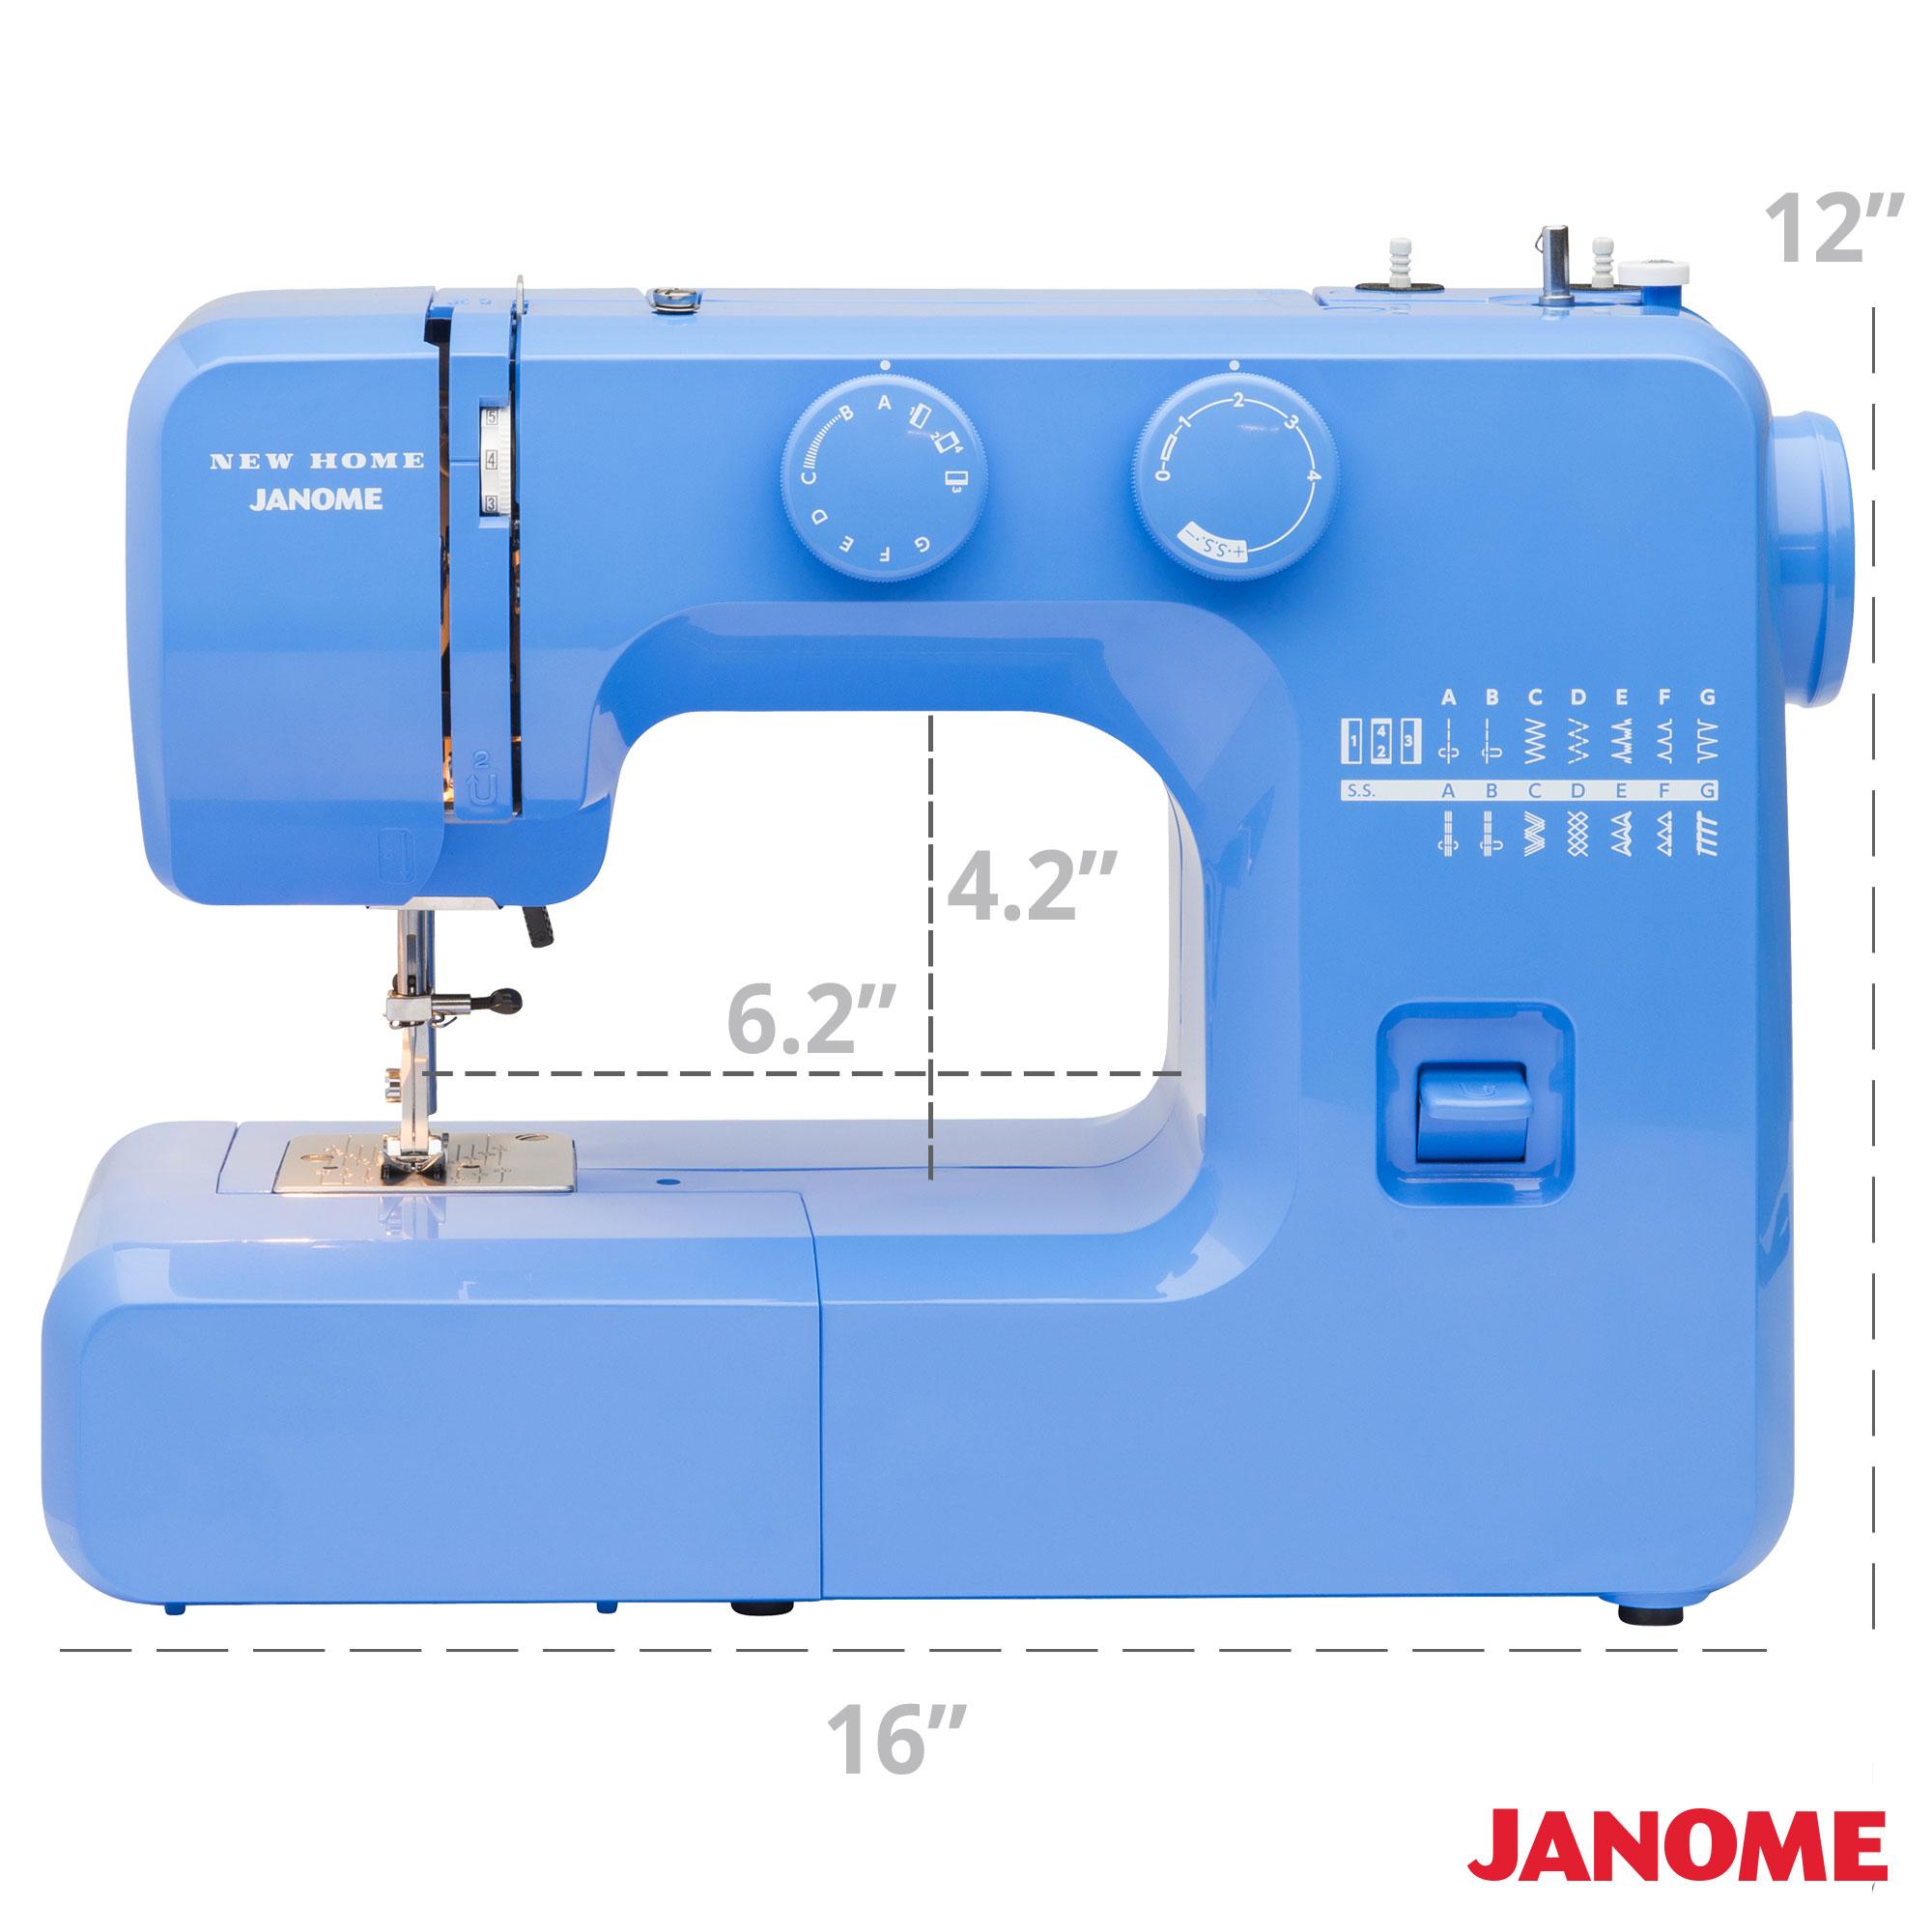 pro quilting janome quilt products updates usb update lg maker machines machine